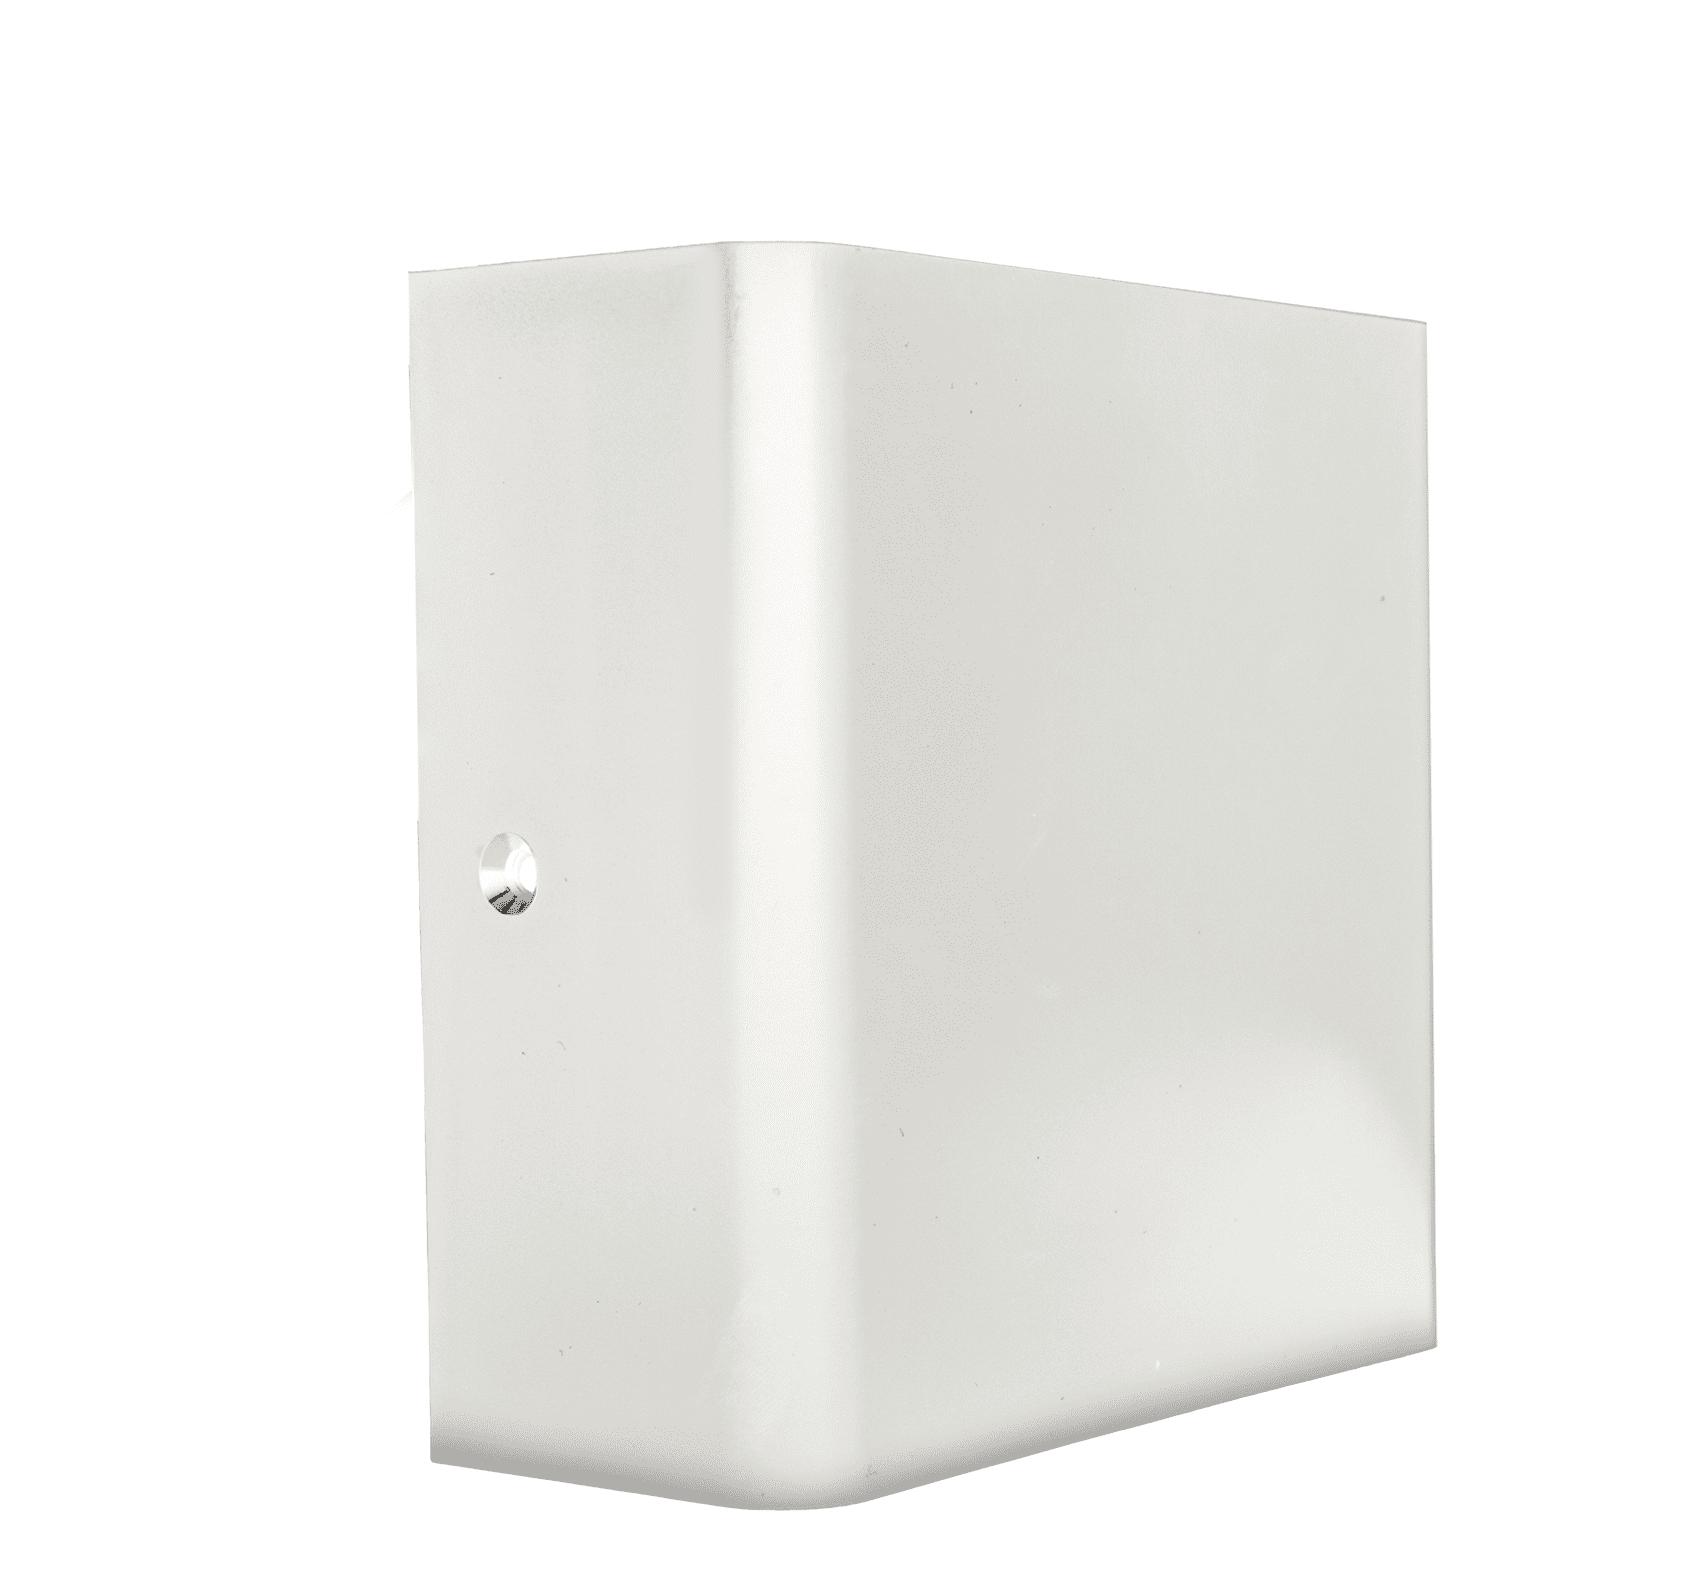 Luminária Arandela de LED Kian 12822 IP65 3W 3000K Branca